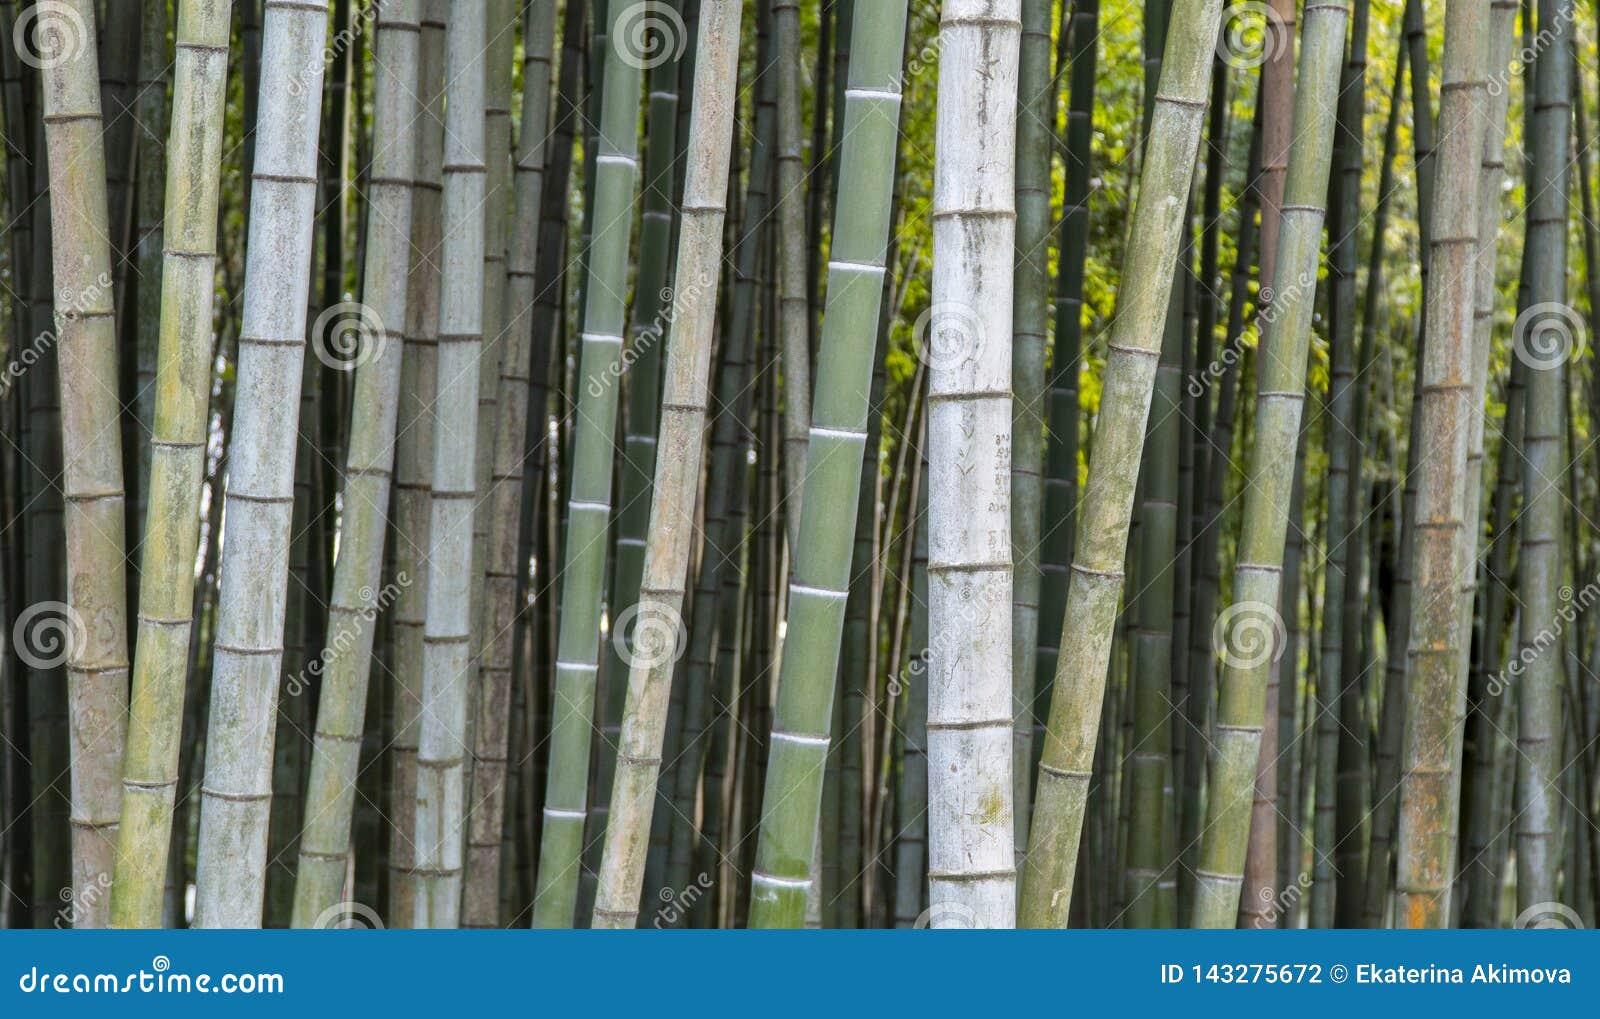 Papel de parede de bambu do fundo